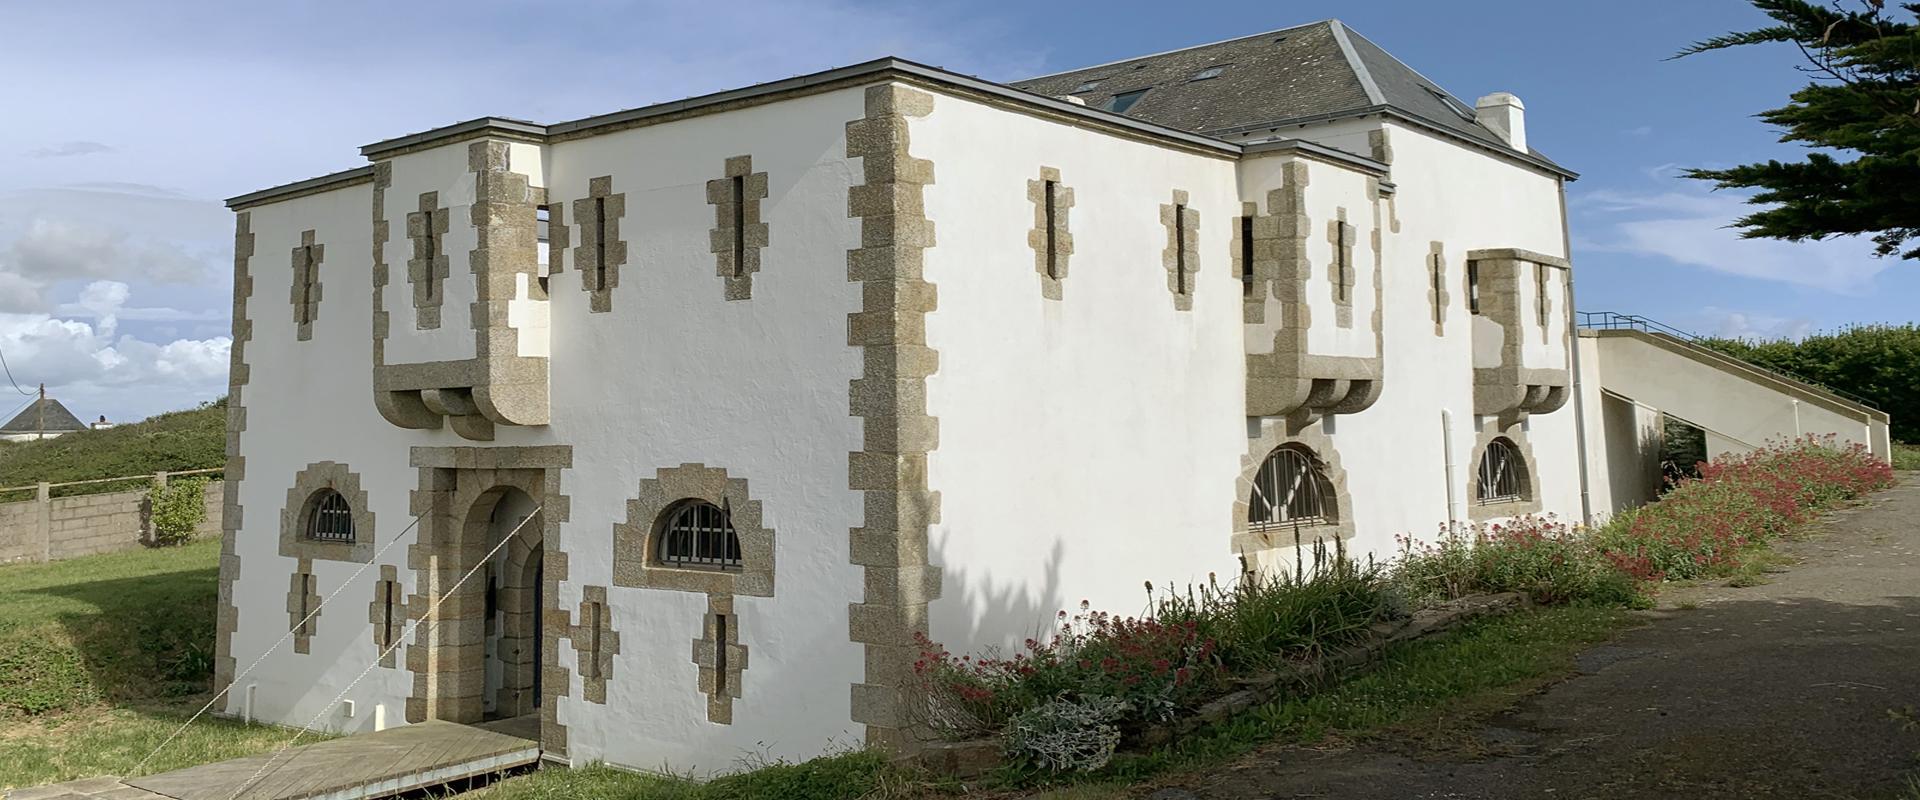 Fort Clohars